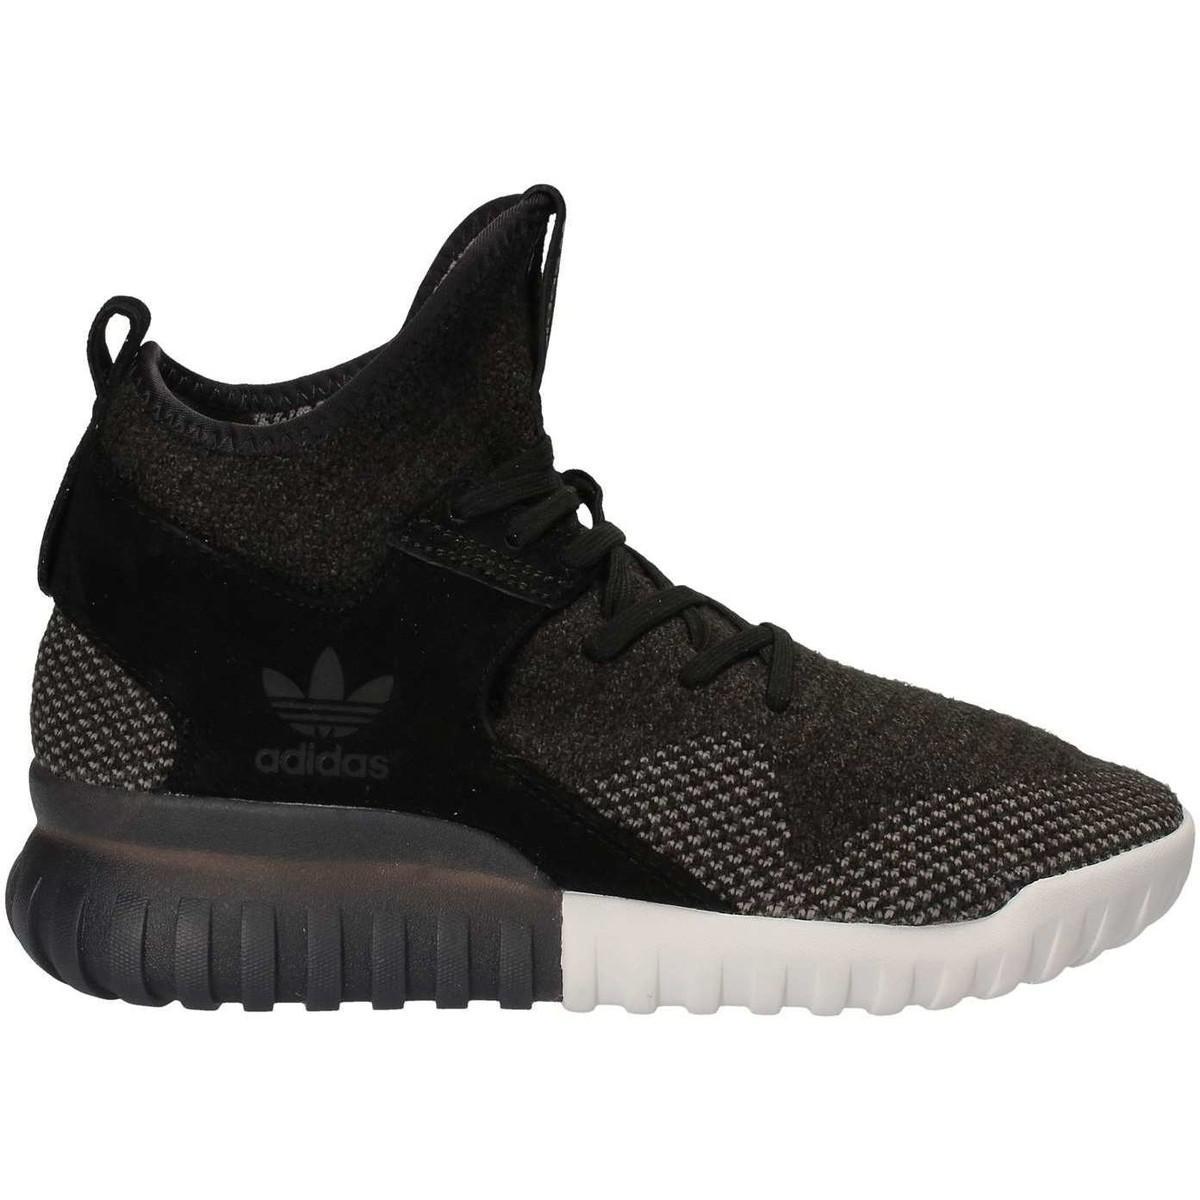 adidas originali bb2379 scarpe uomo nero scarpe da uomo (high top